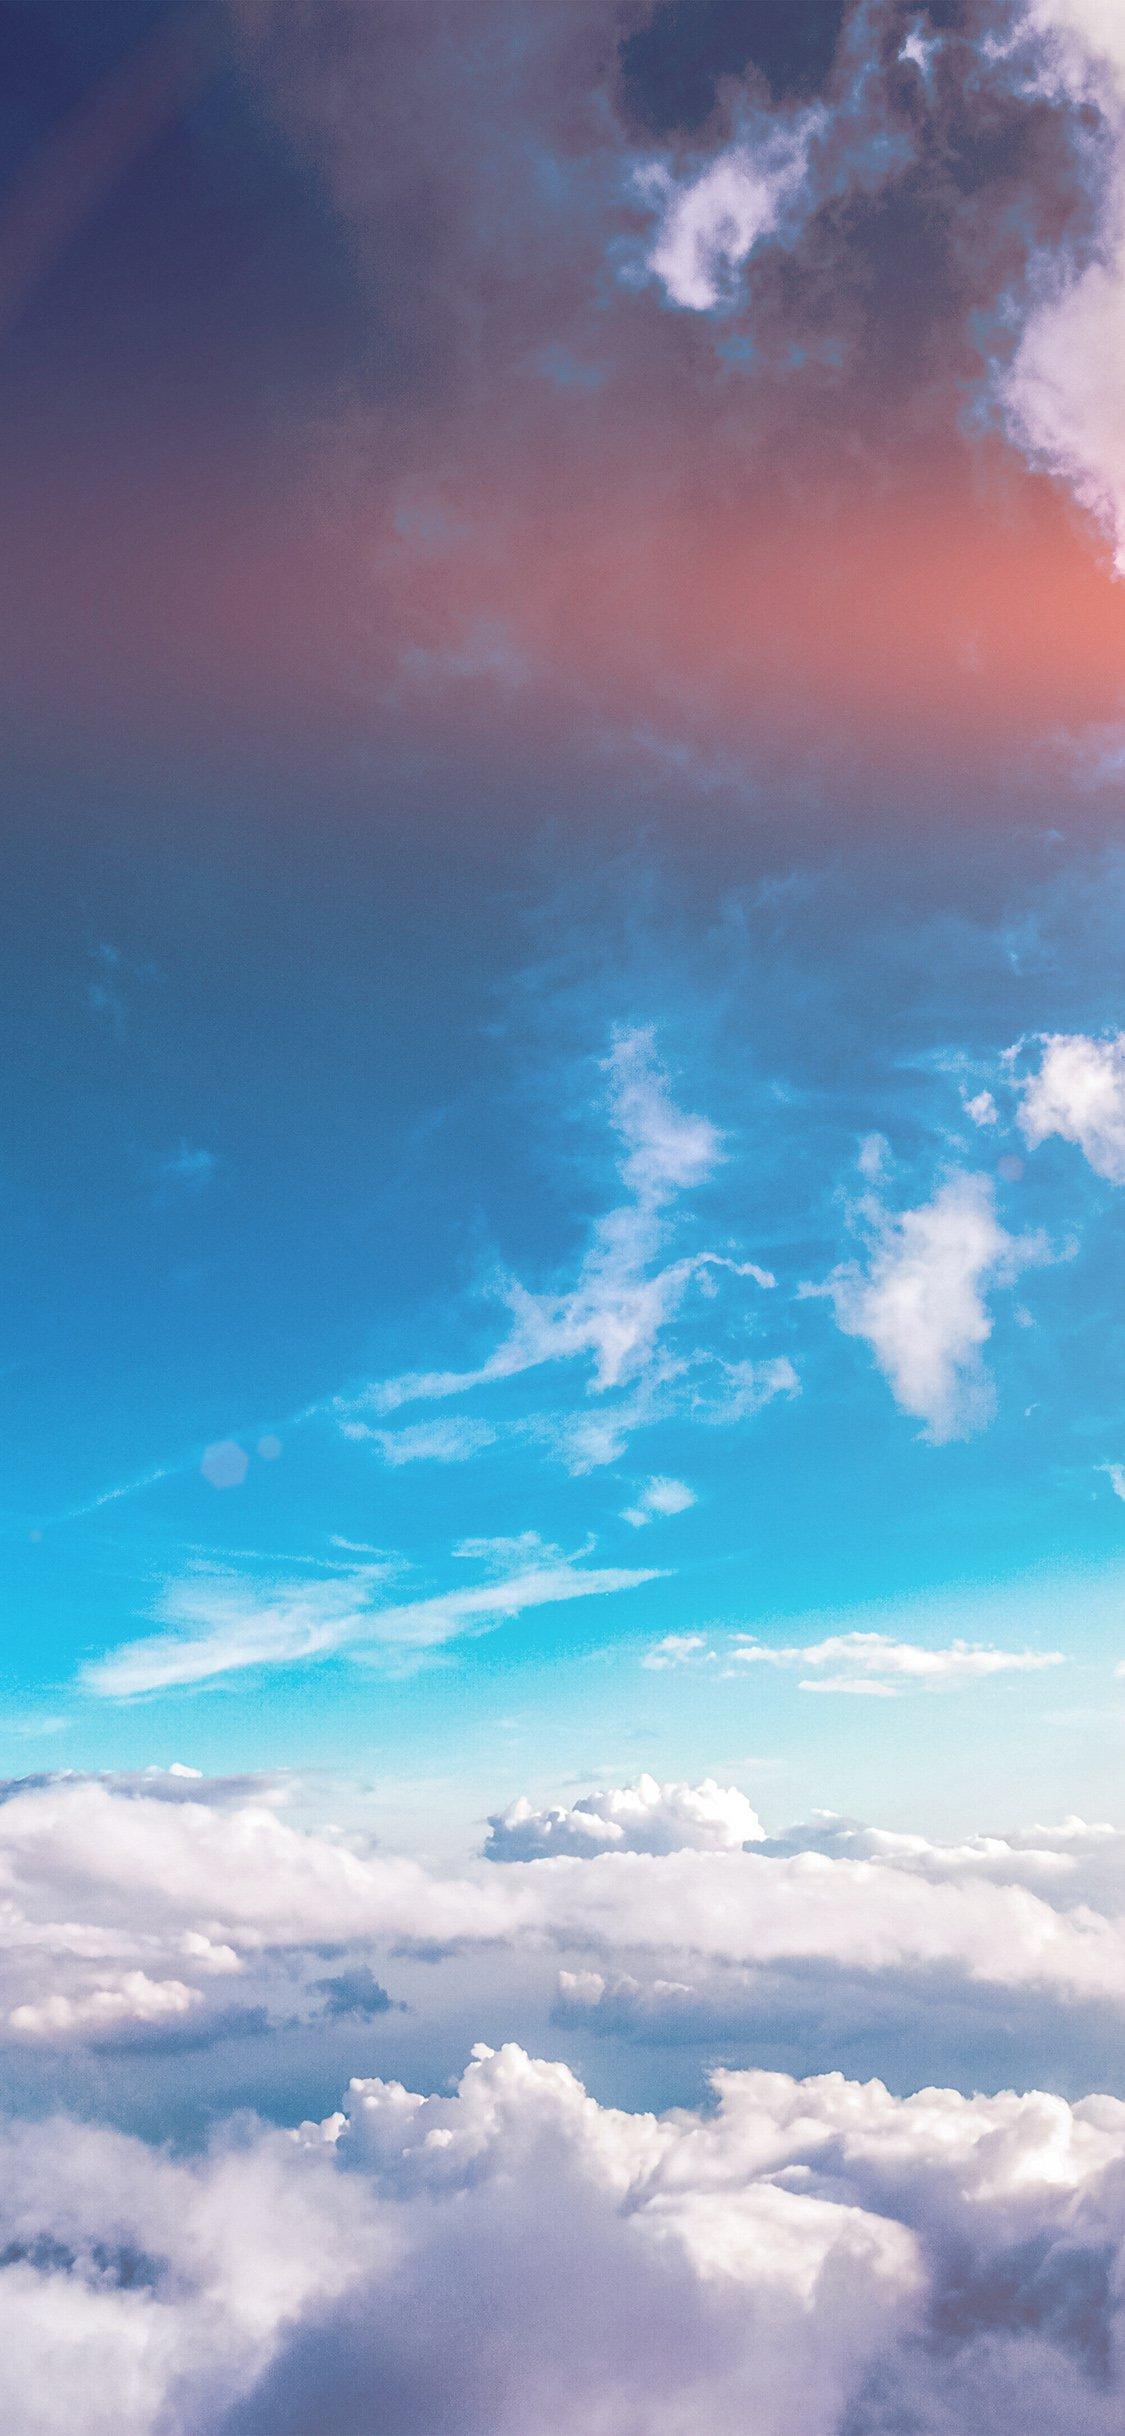 Summer sunny flare iPhone X wallpaper